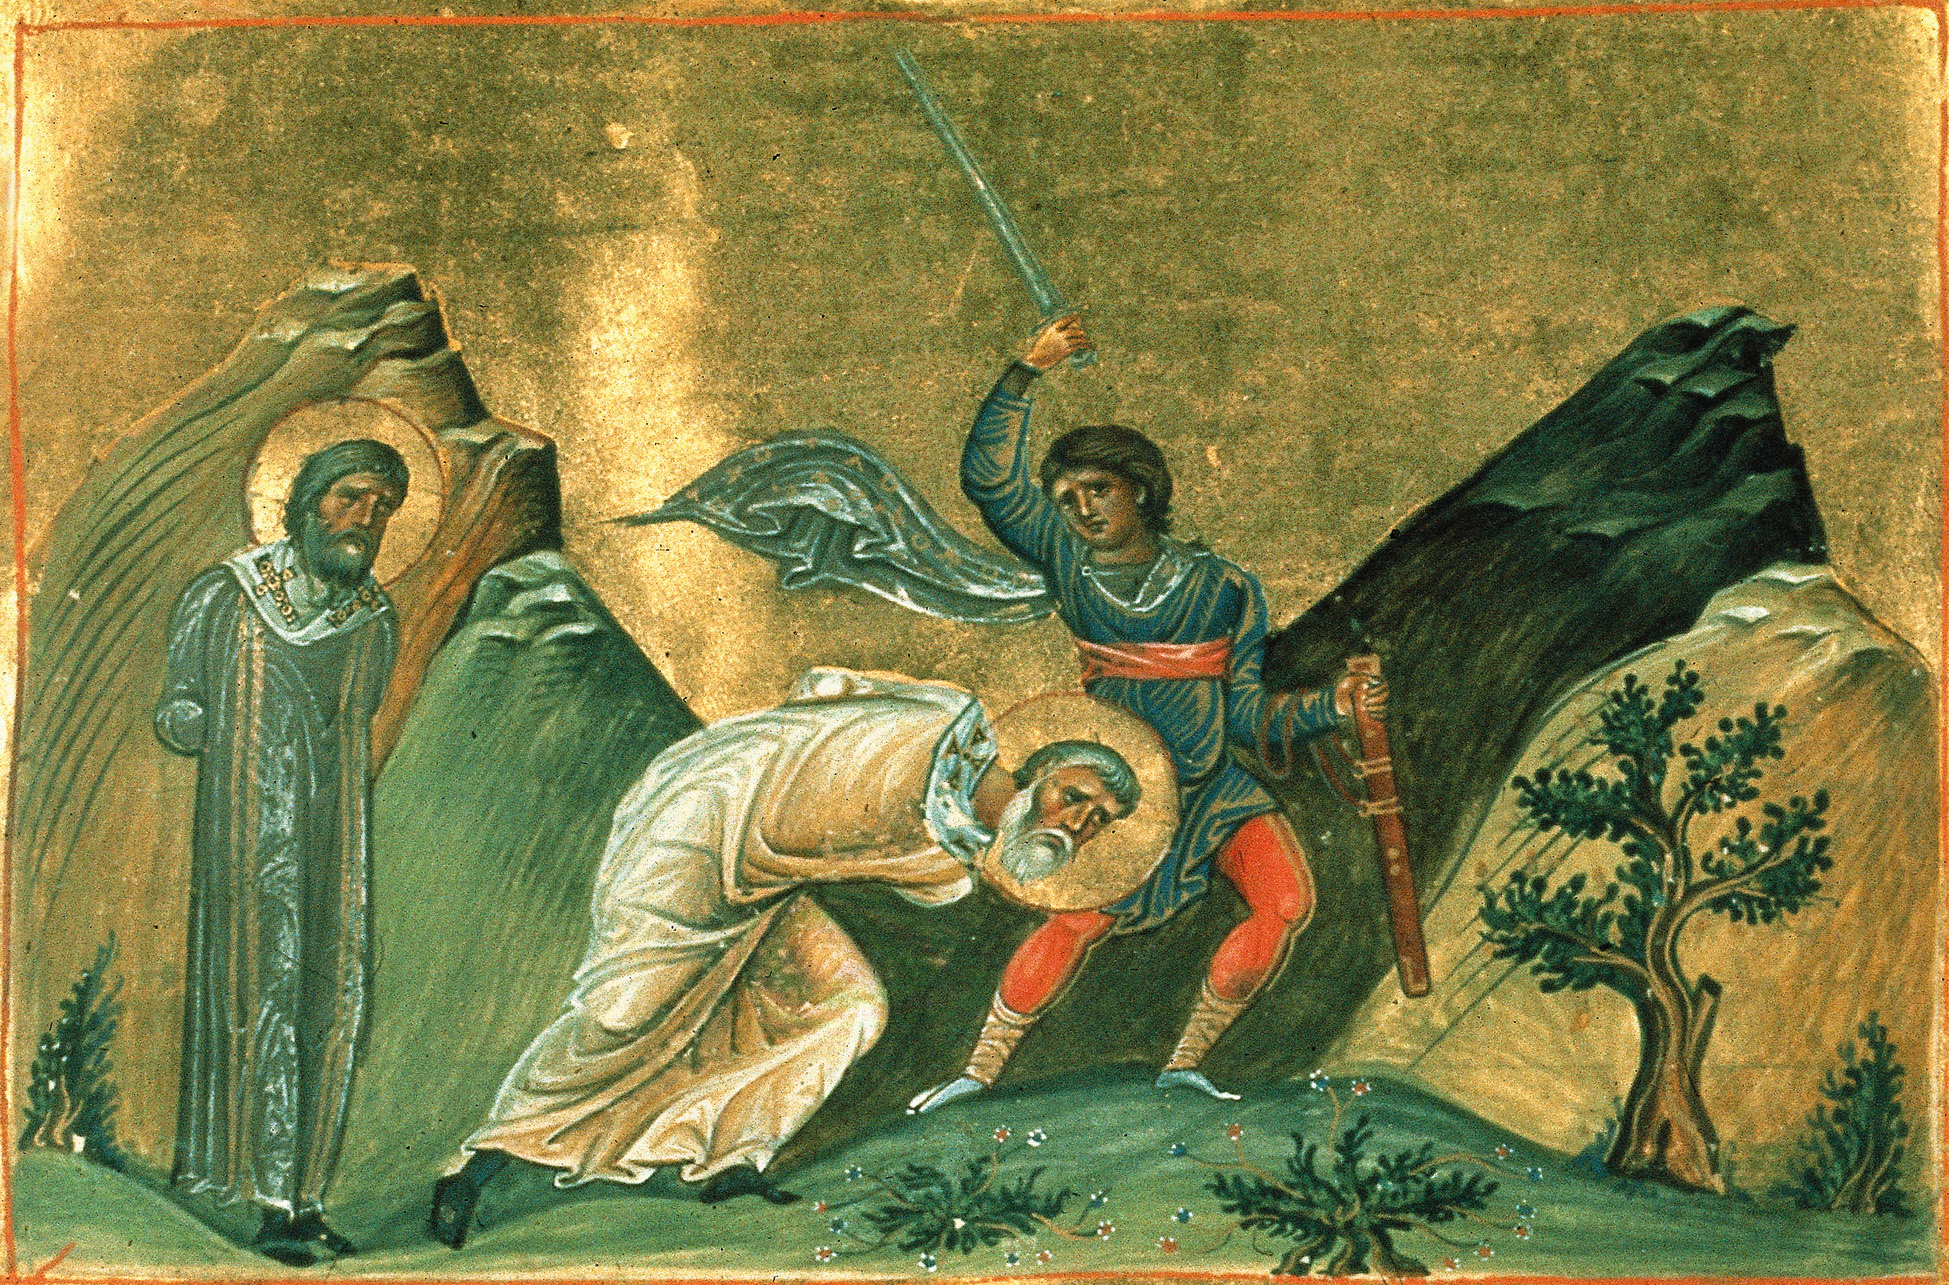 De hellige Nerses og Josef i keiser Basilios IIs Menologion (1000-t)